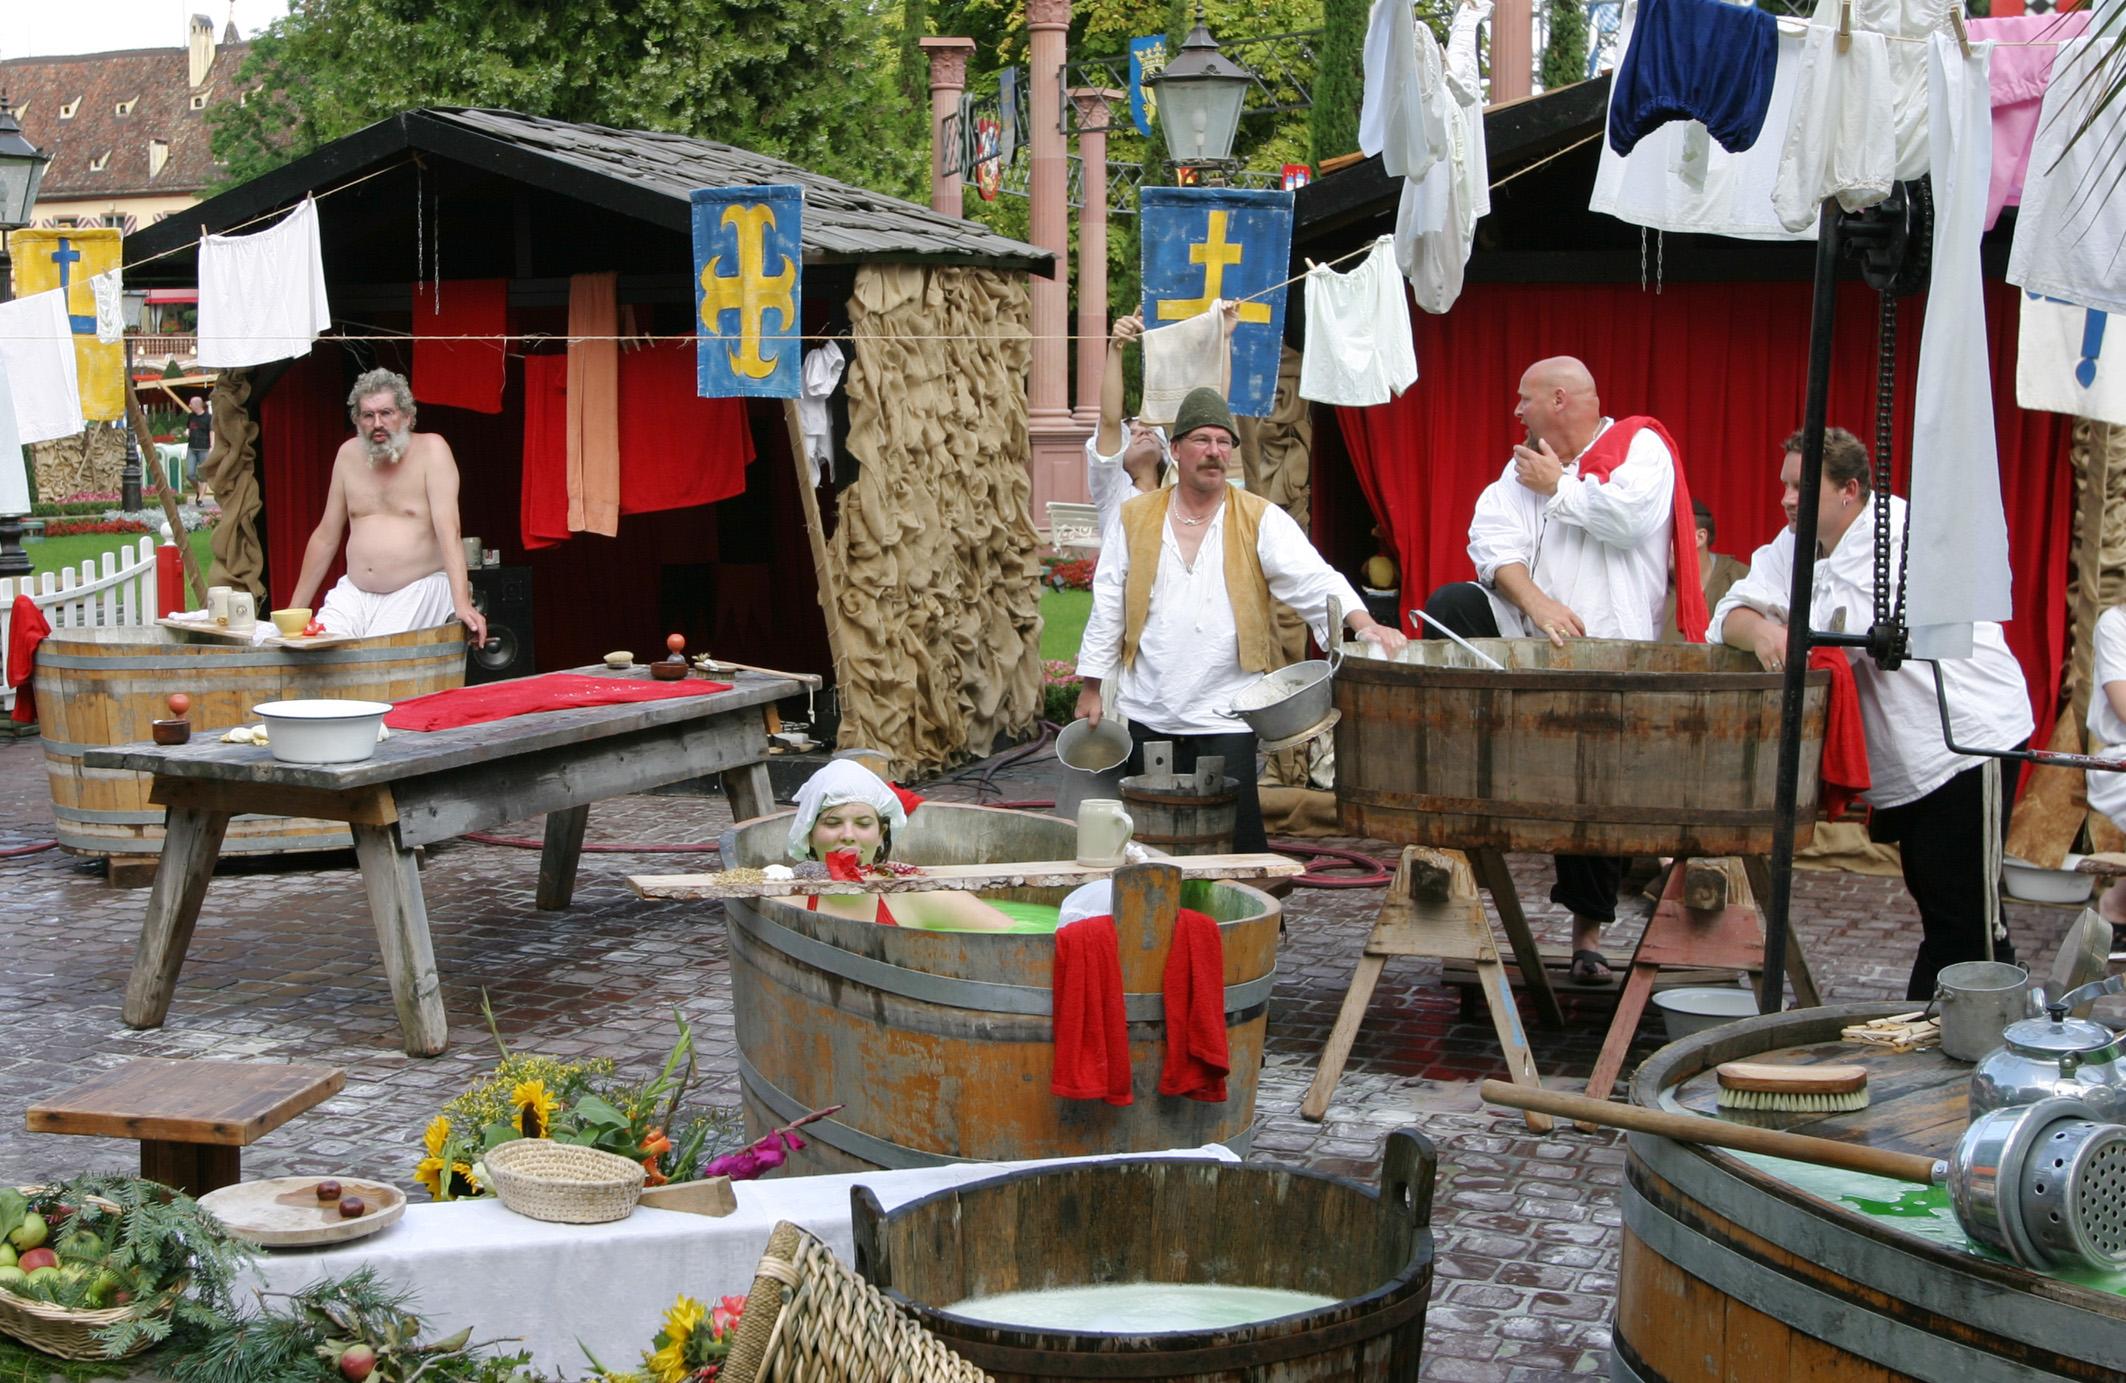 Mittelalter Badehaus